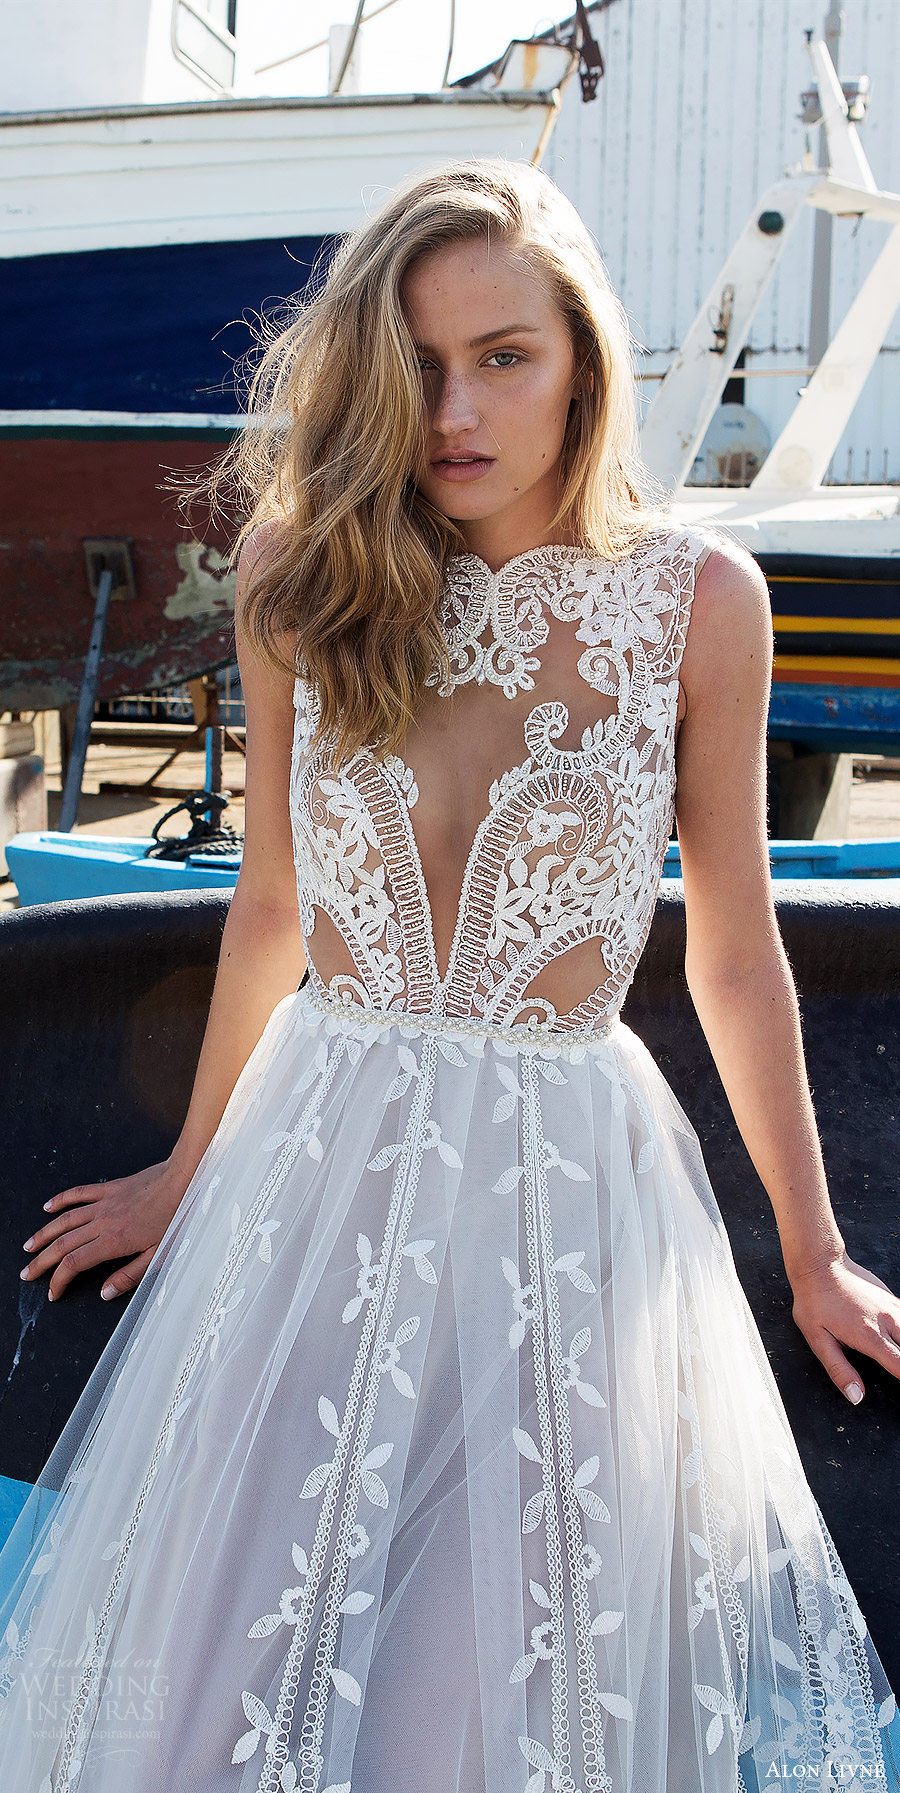 alon livne white pre 2018 bridal sleeveless jewel neck sheer bodice lace ball gown wedding dress (beatrice) zfv princess romantic